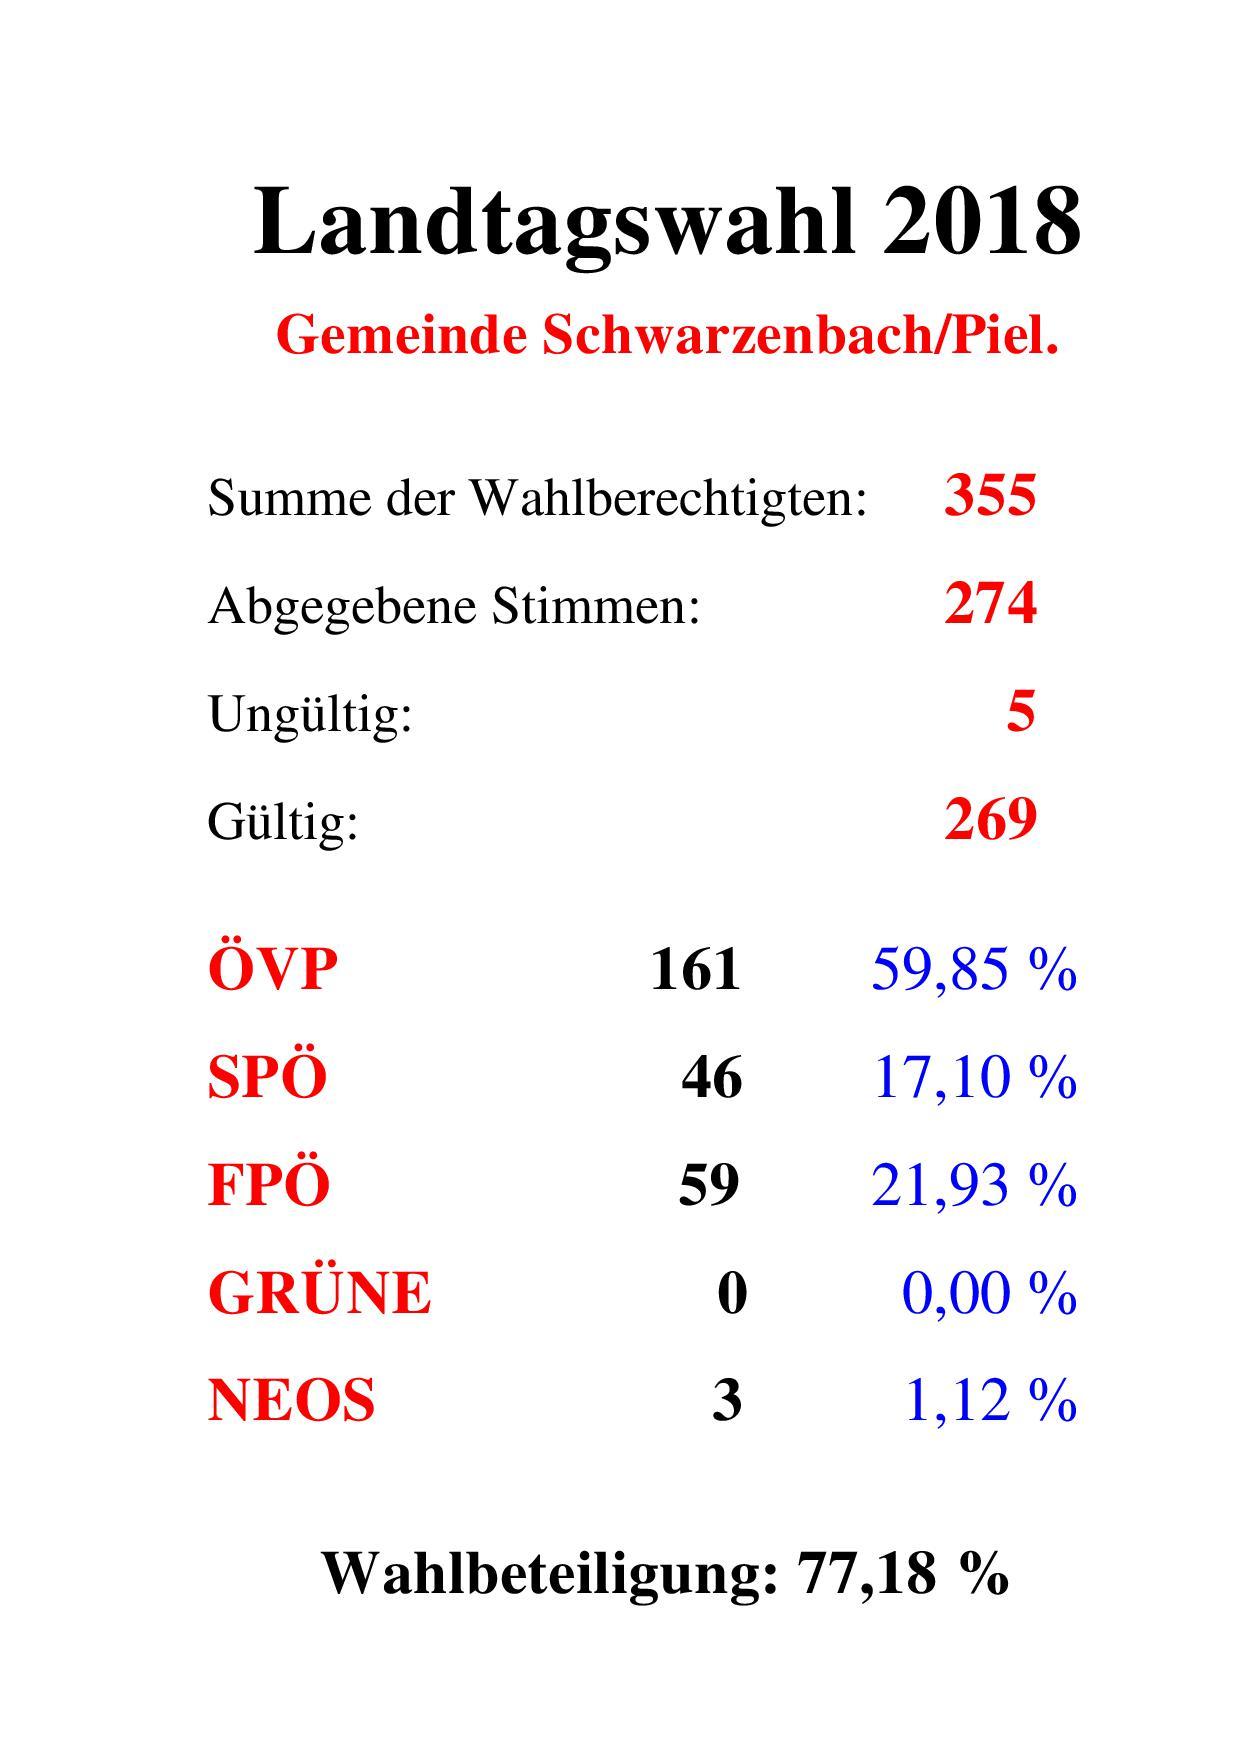 Landtagswahl Schwarzenbach